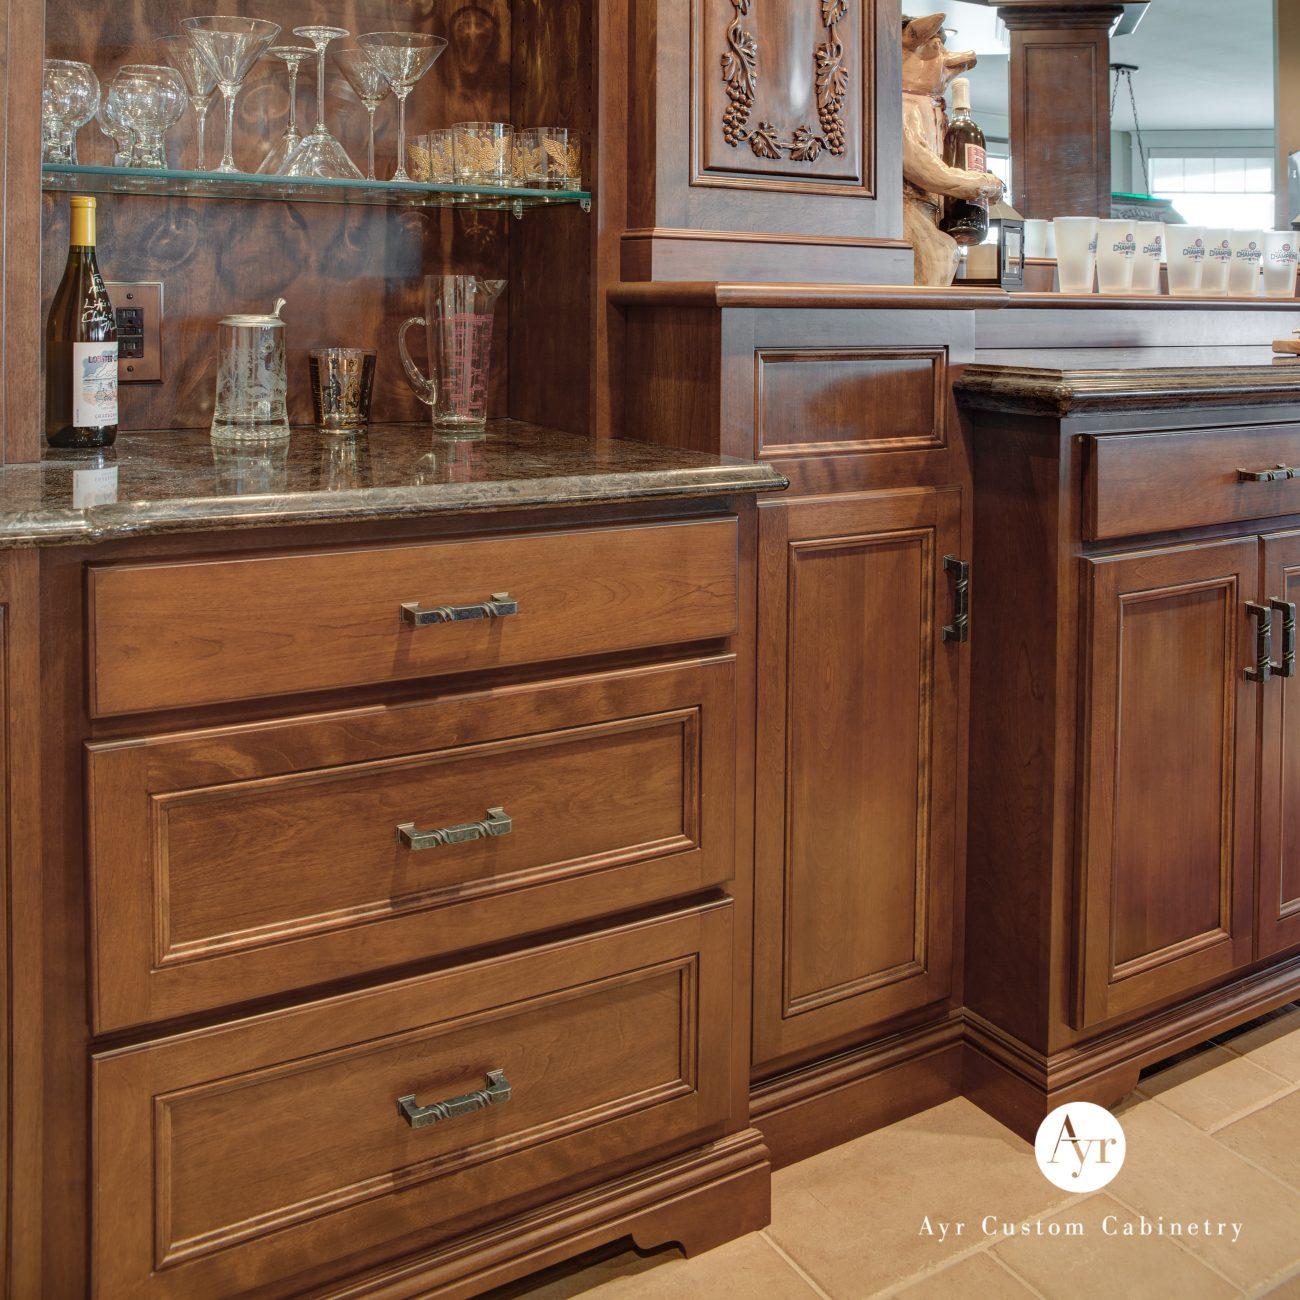 custom bar cabinets, product spotlight 2